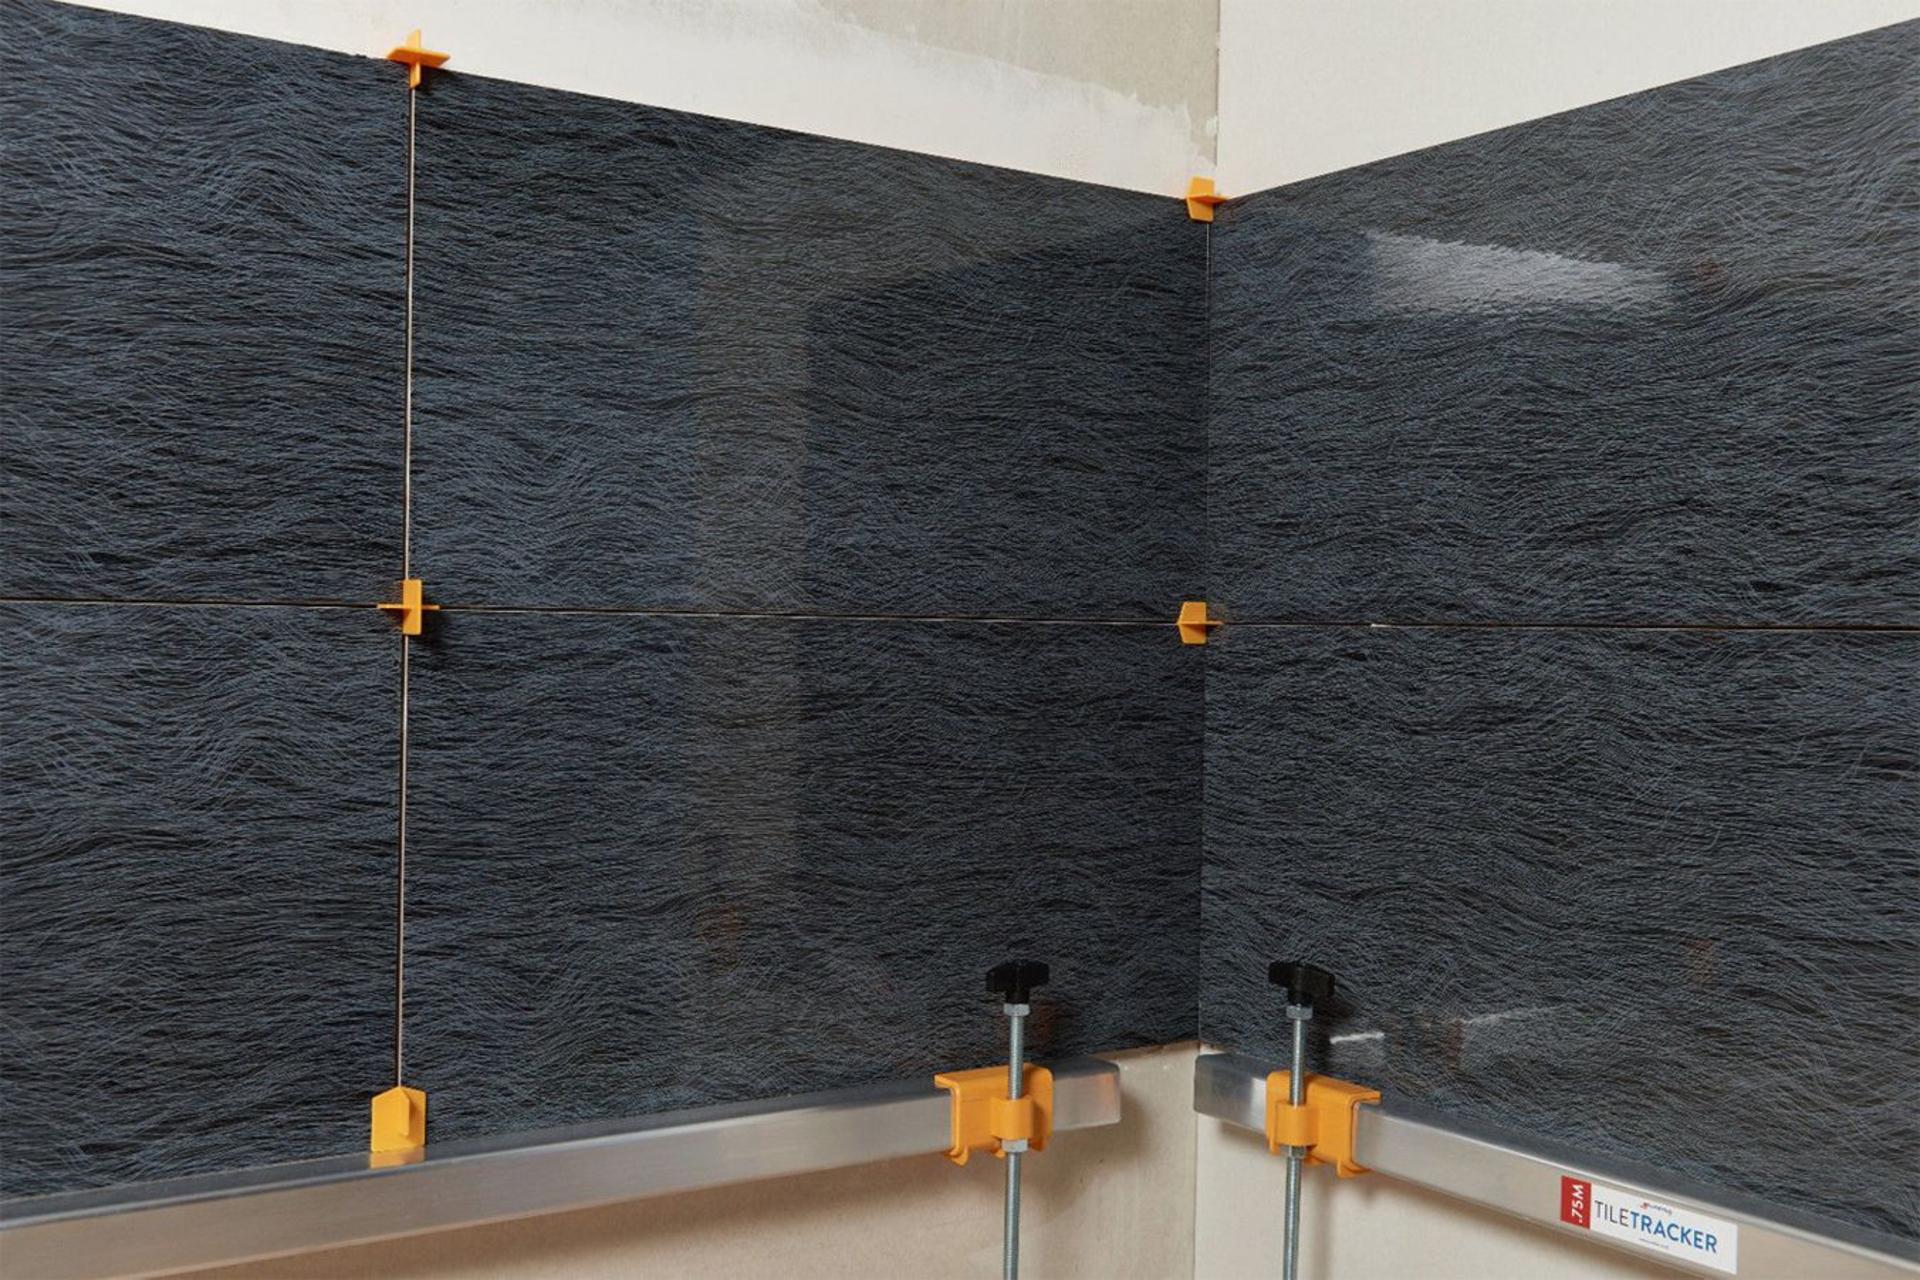 Zoom The World - tiletracker-ultimate-wall-tiling-baton-kit-[3]-77997-p